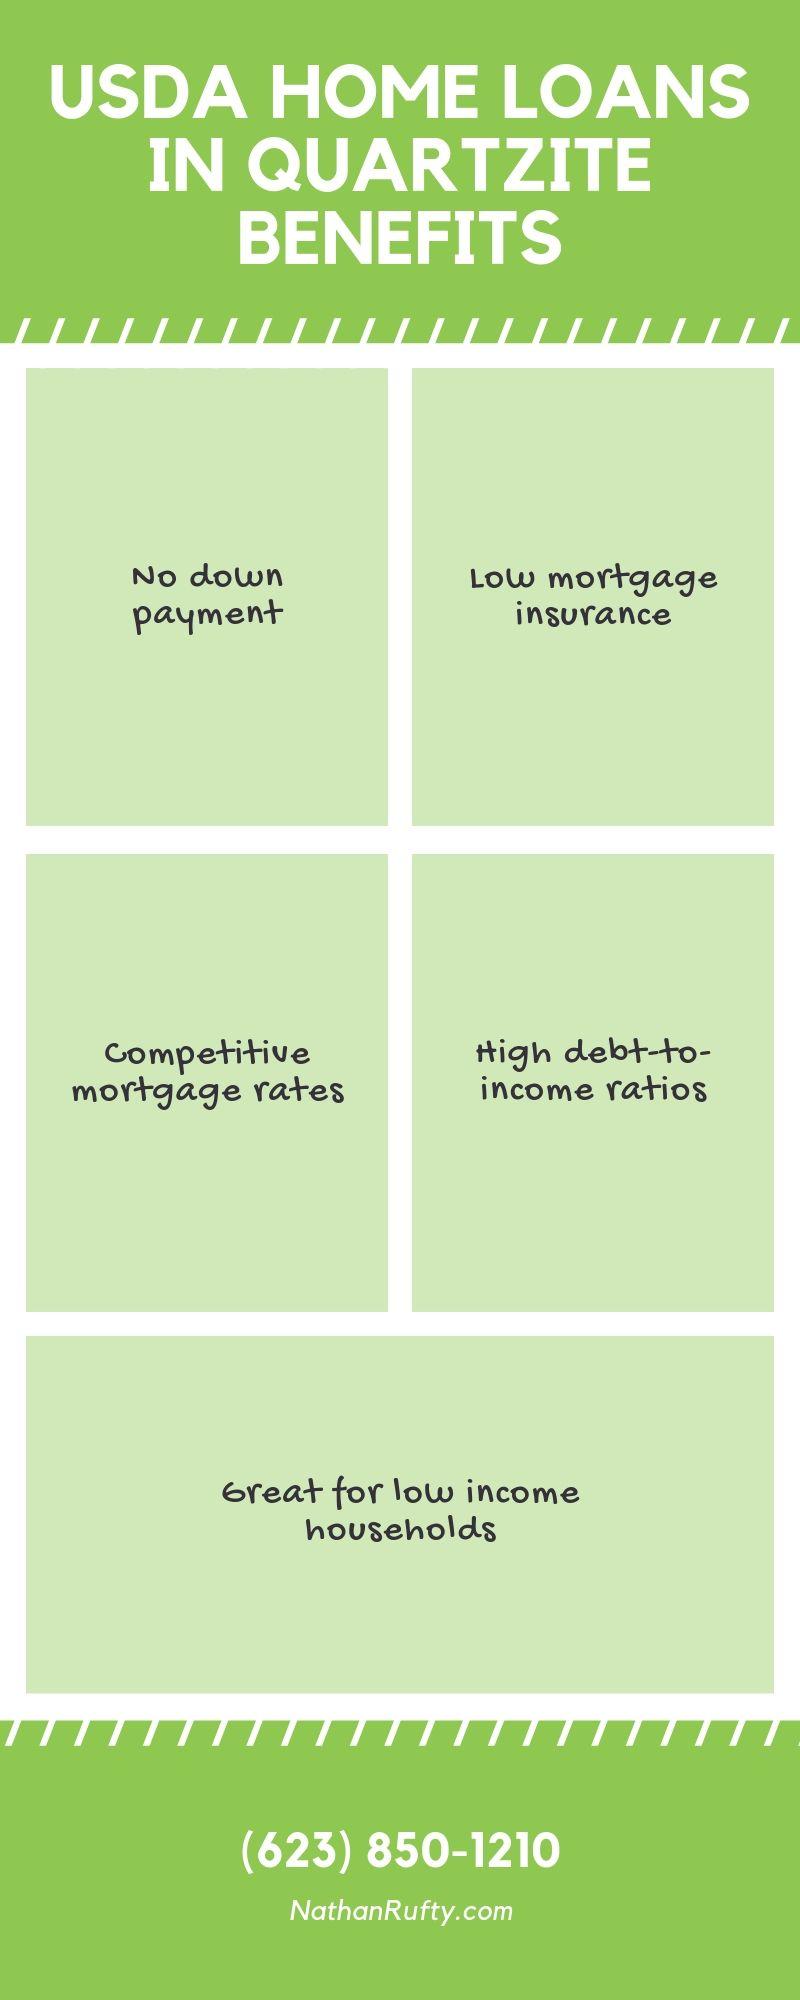 Usda Home Loans >> Purchase And Refinance Home Loan Programs In California And Arizona